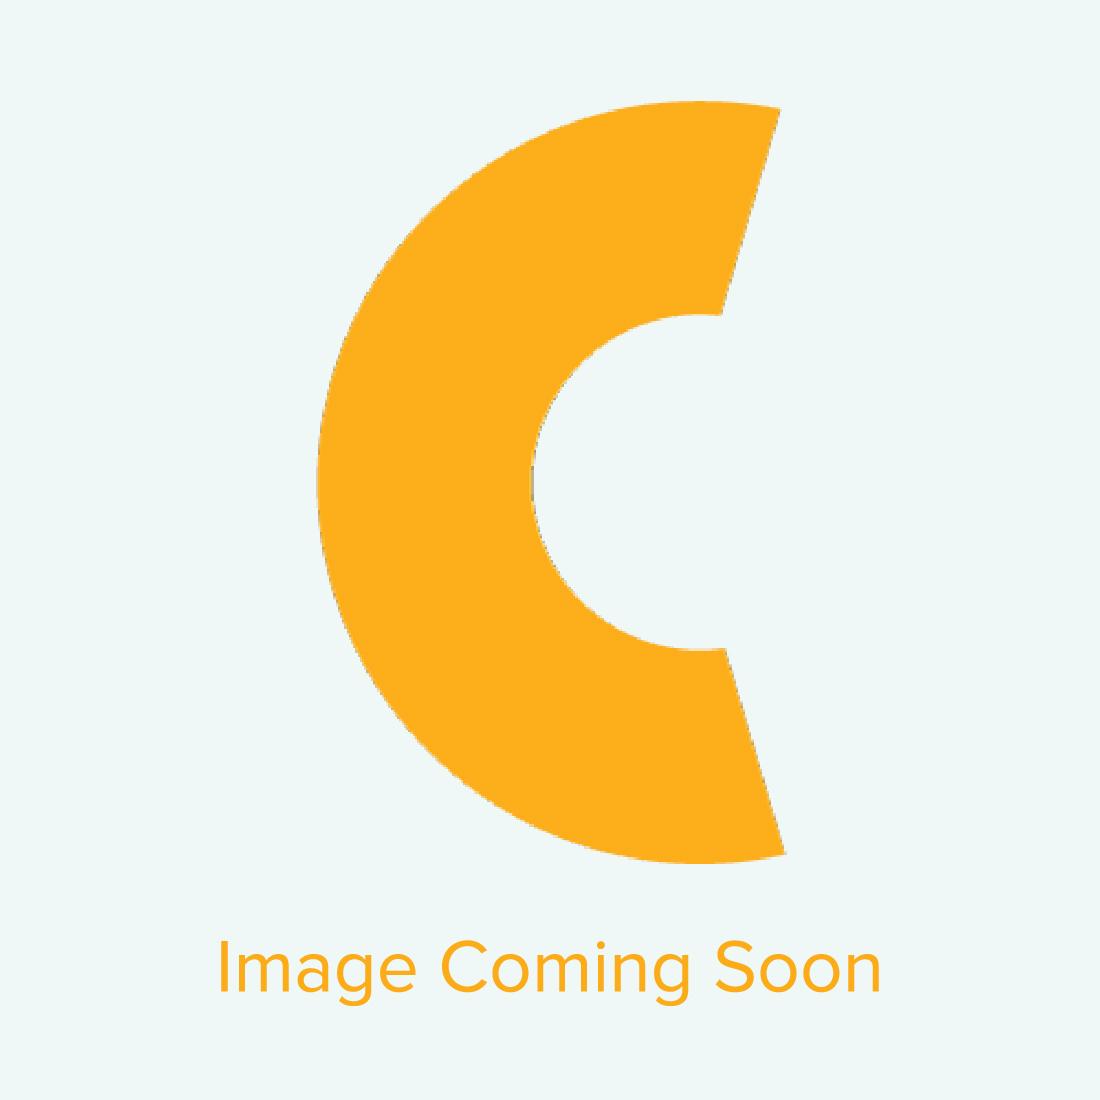 "8"" x 10"" Hardboard Sublimation Photo Panels with Kickstand – 15/case"